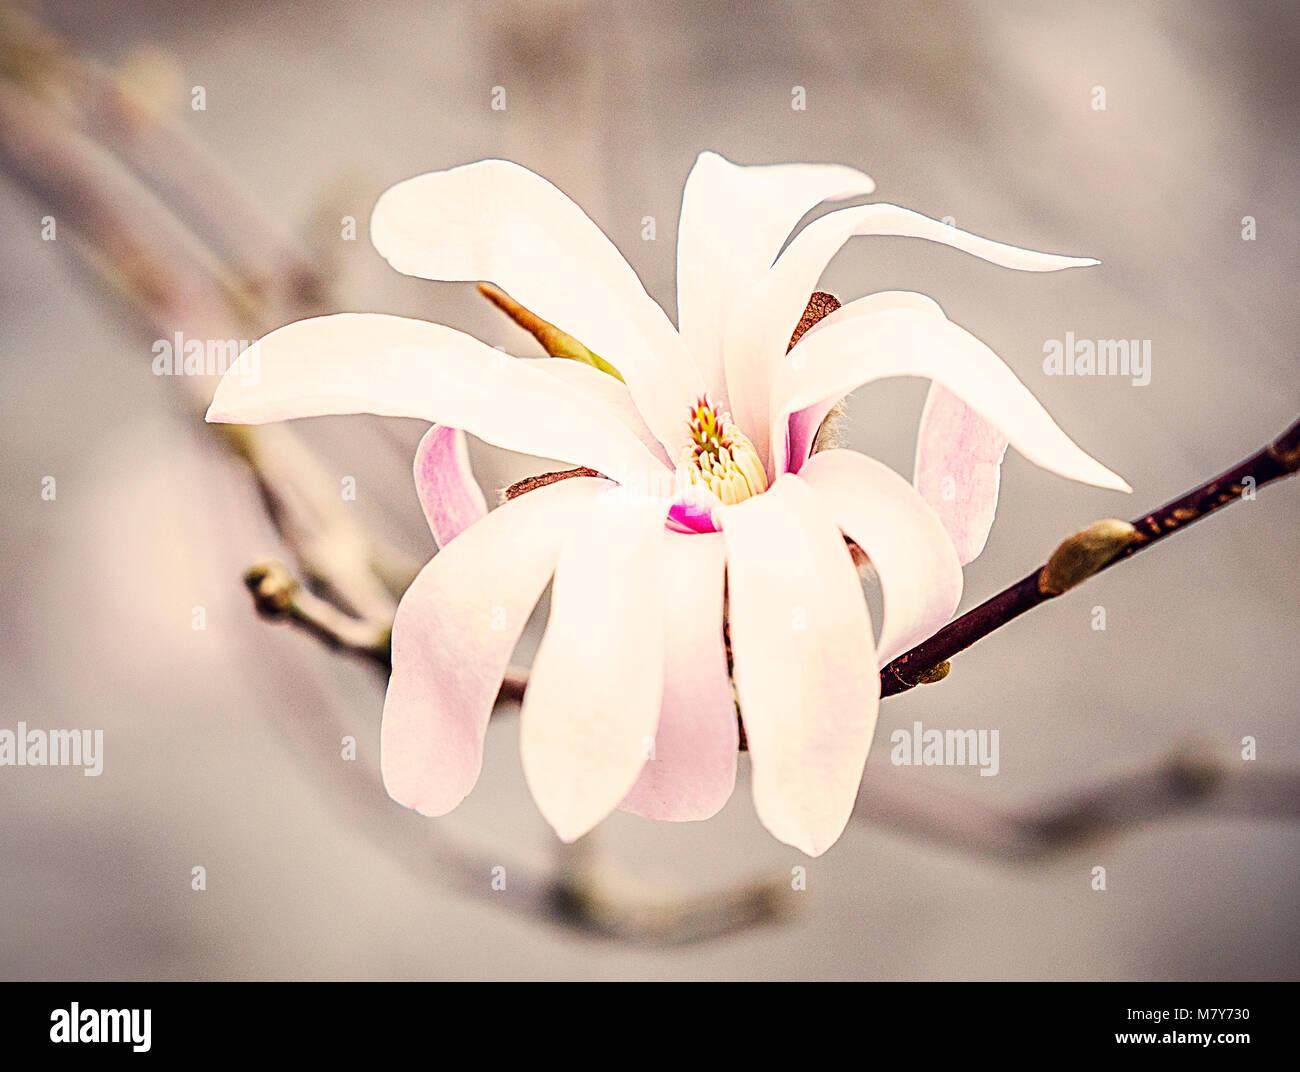 magnolia stellata, france - Stock Image